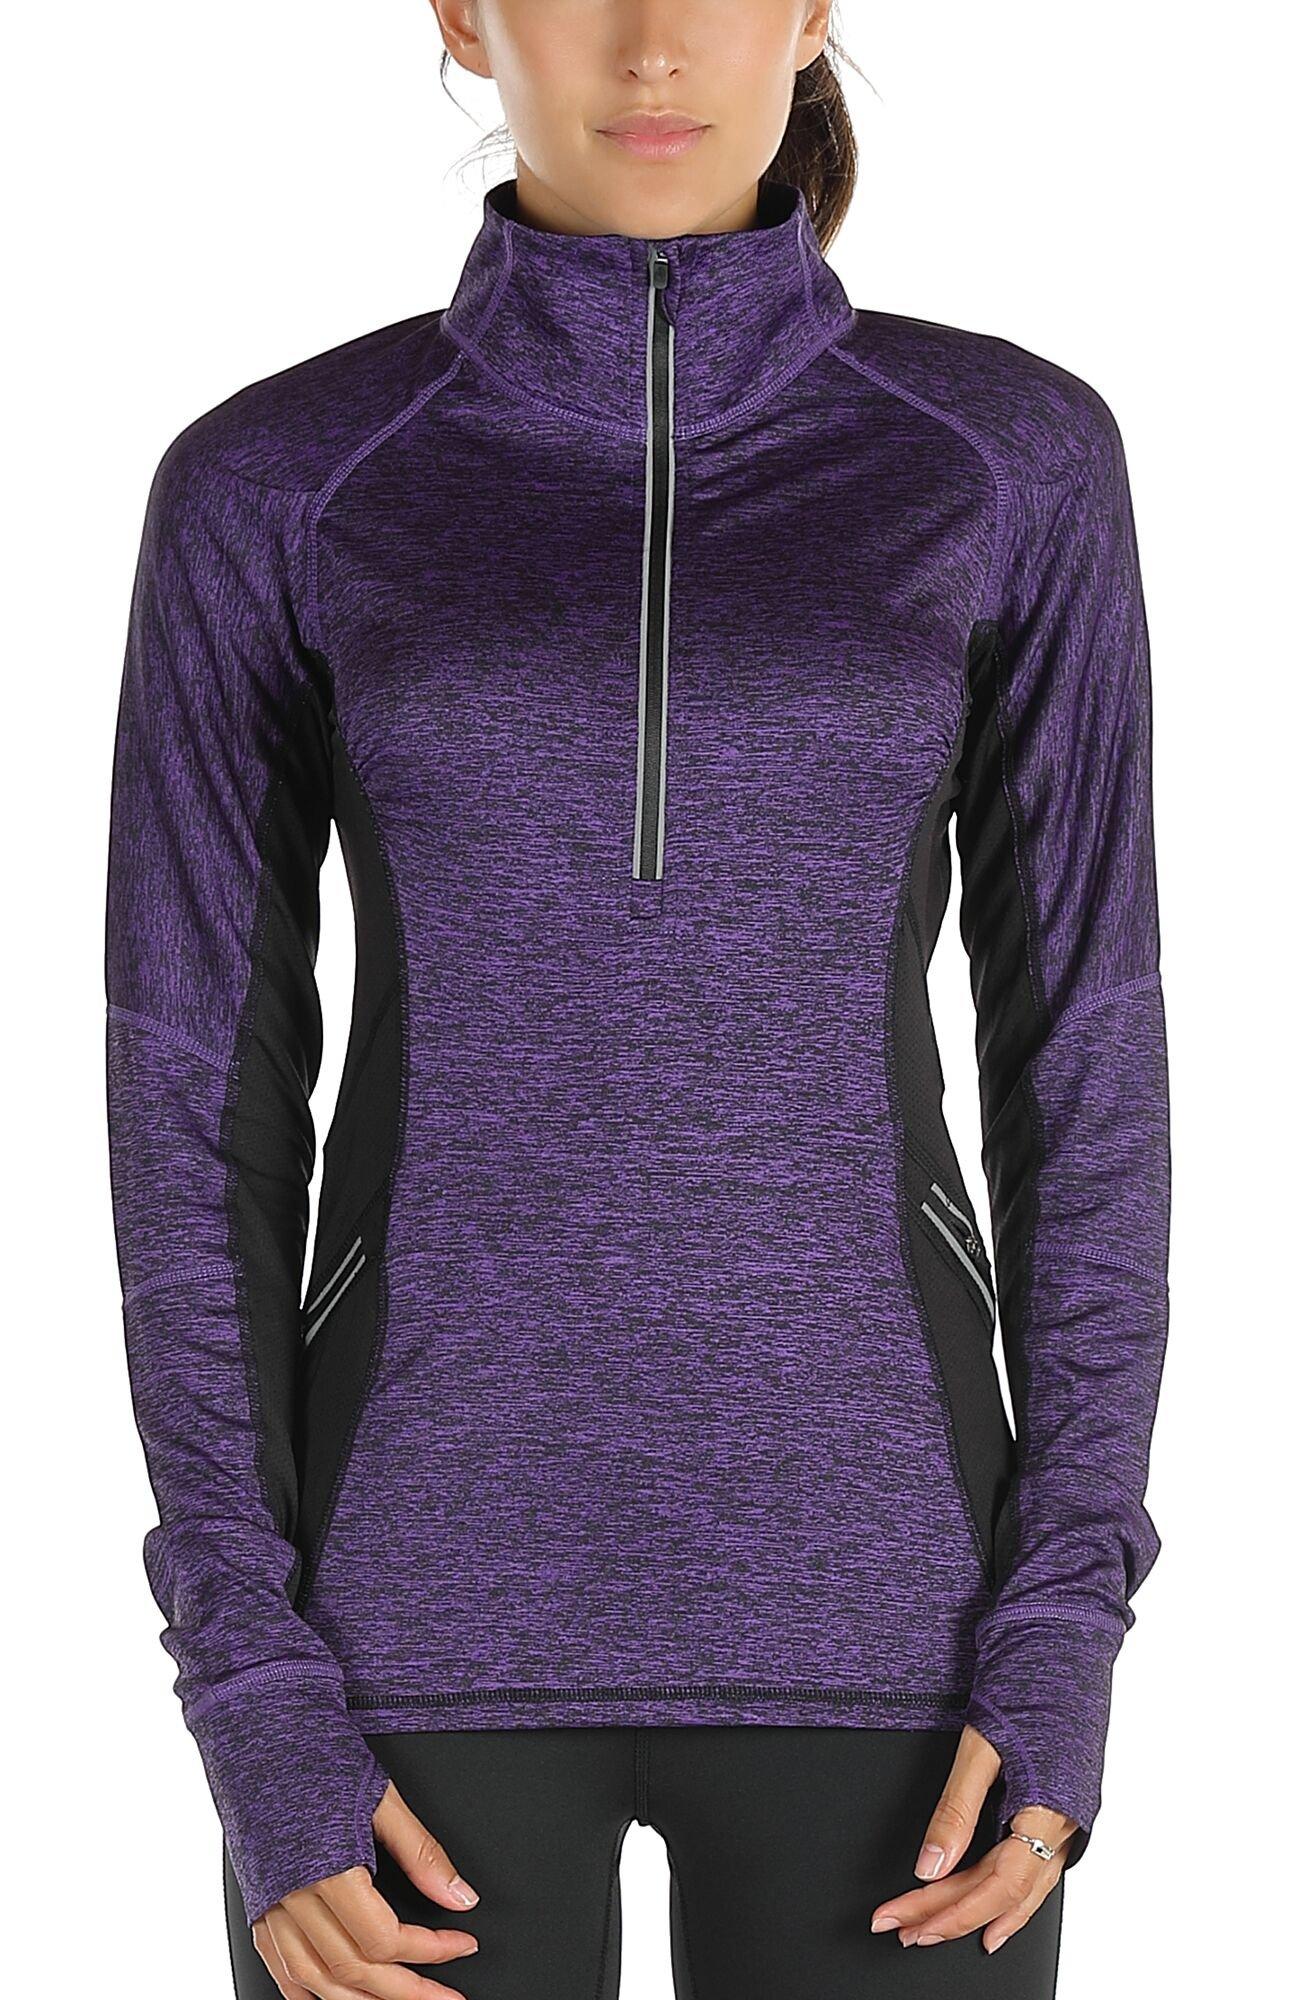 icyzone Women's Workout Yoga Track Jacket 1/2 Zip Long Sleeve Running Shirt (M, Purple)